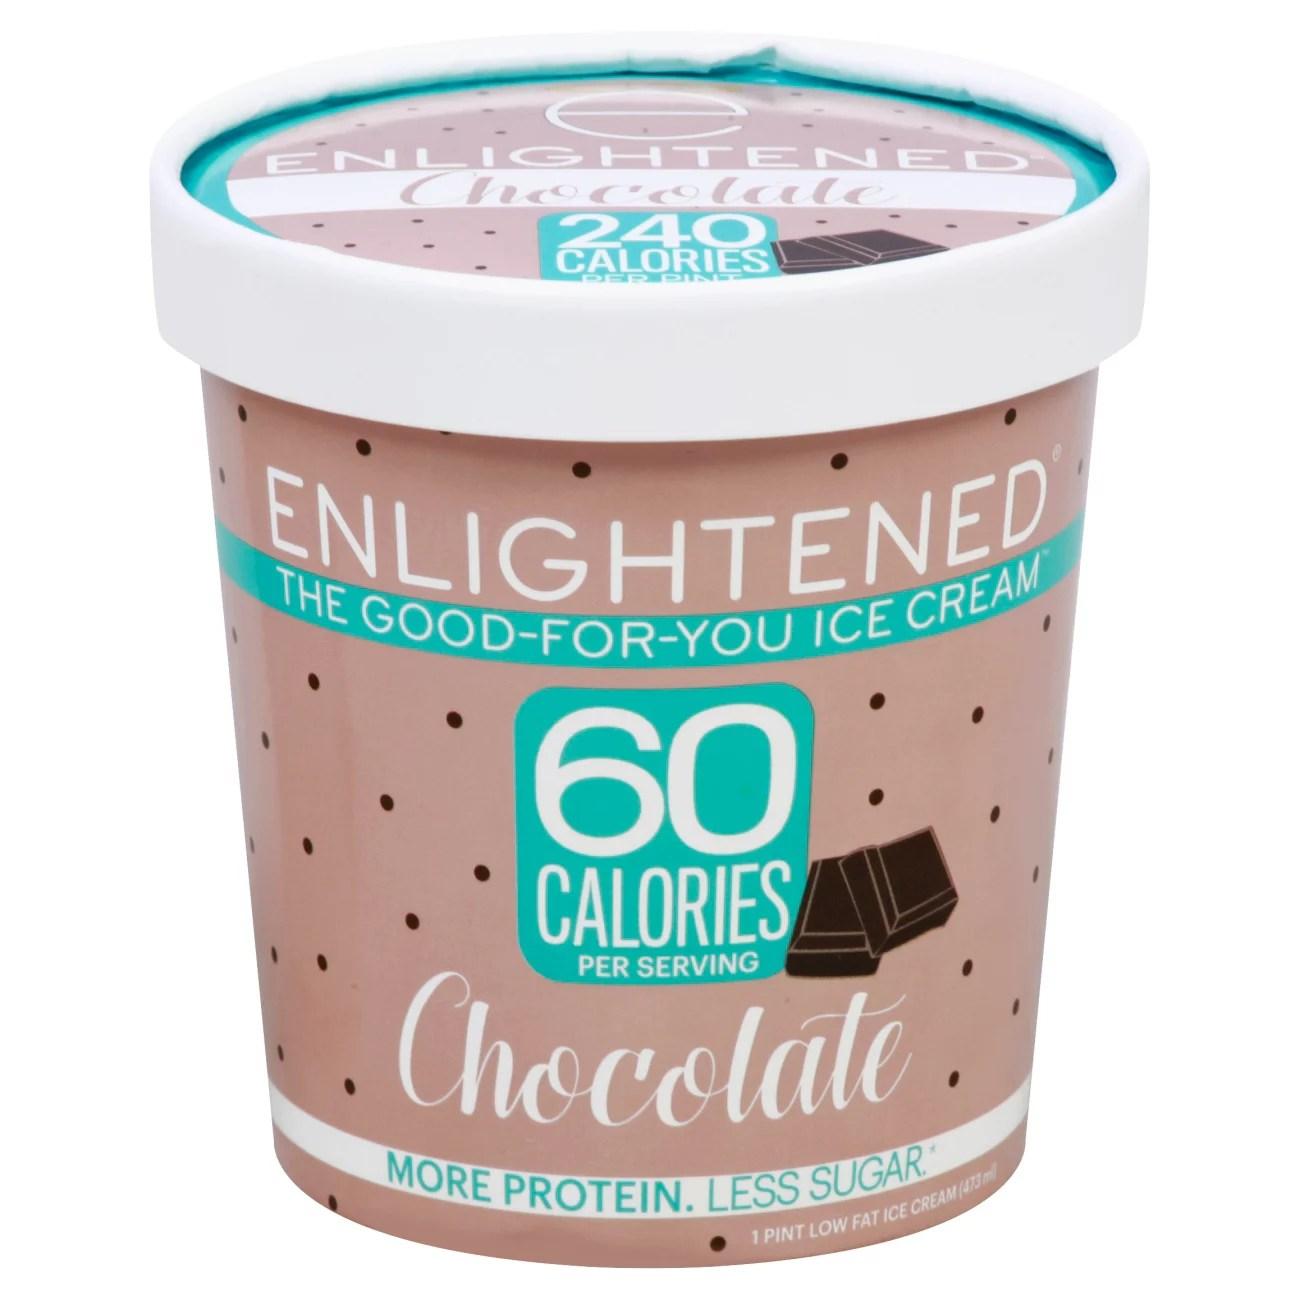 Enlightened Chocolate Ice Cream - Shop Ice Cream at H-E-B